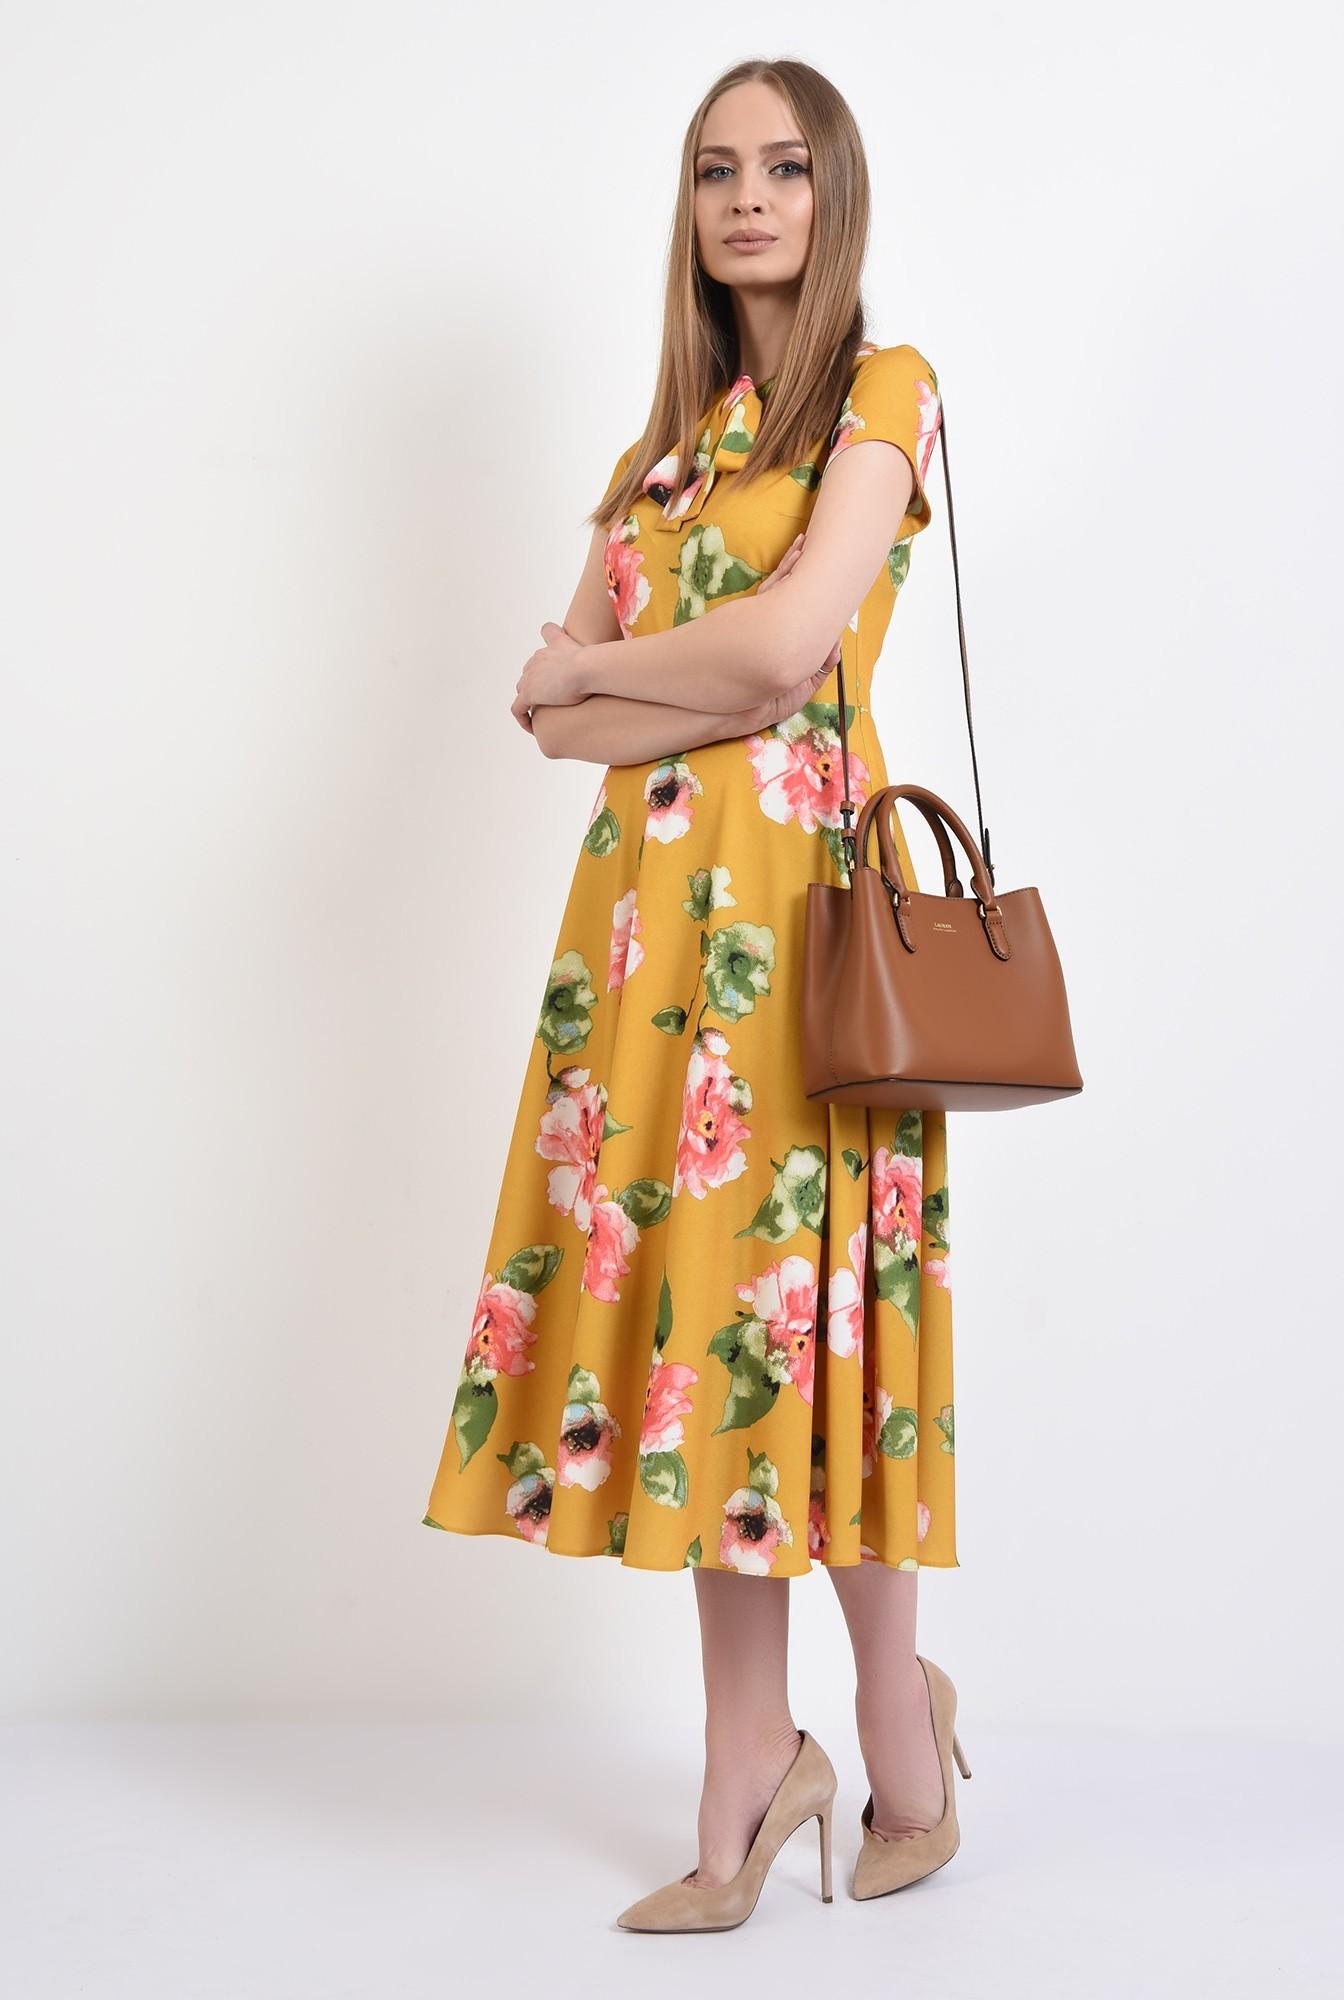 3 - 360 - rochie de primavara, midi, evazata, cu imprimeu floral, Poema